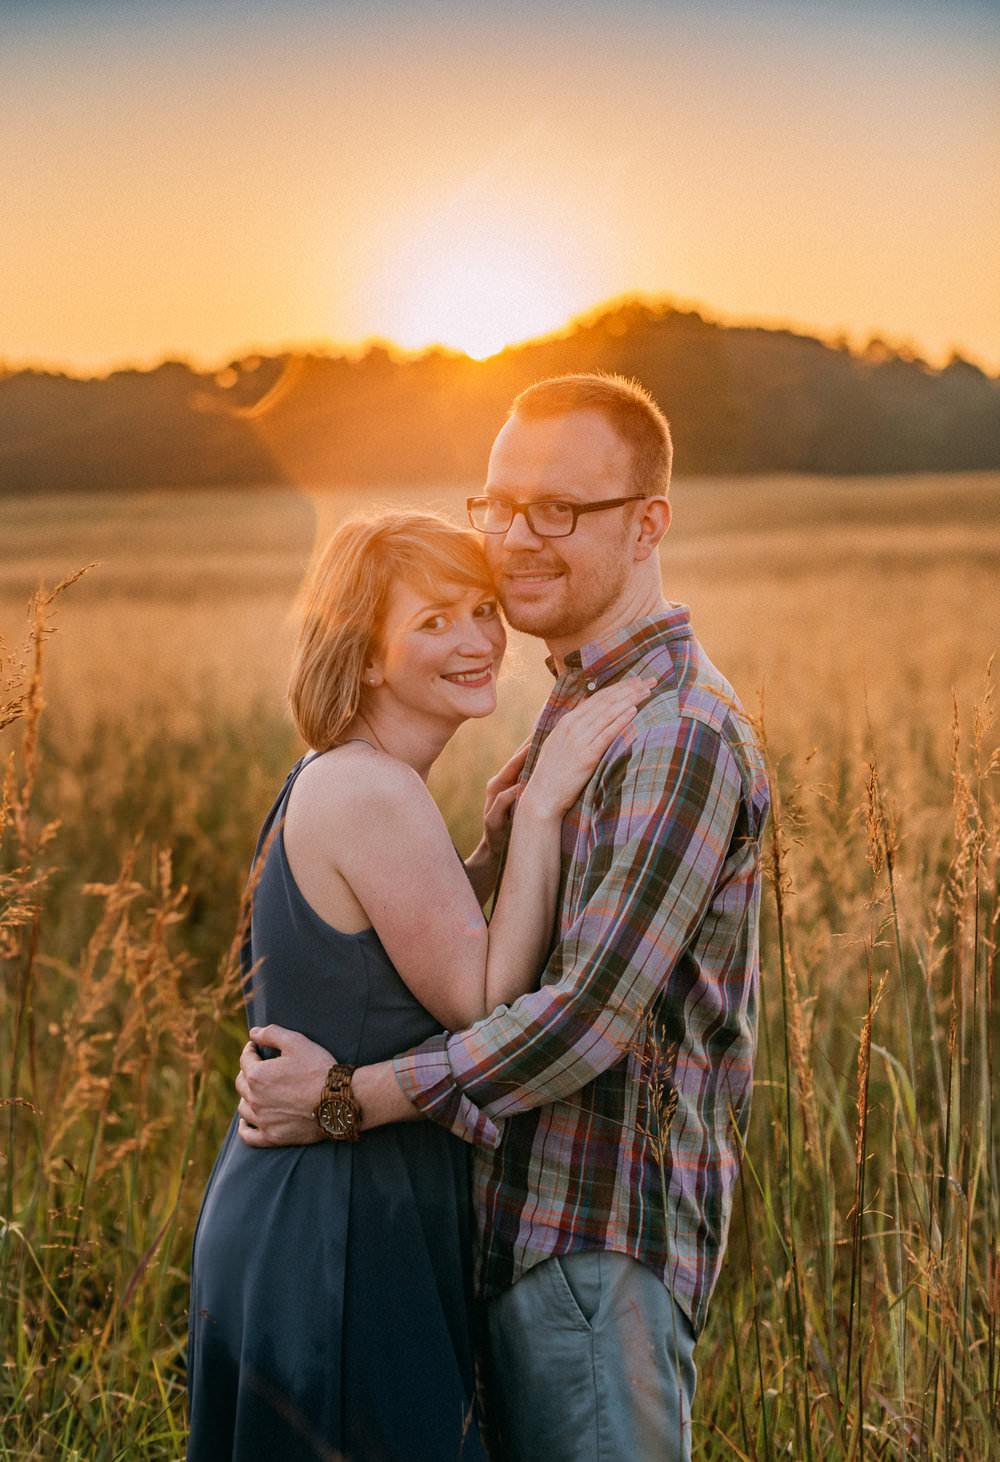 Romantic+Engagement+Photo.jpg